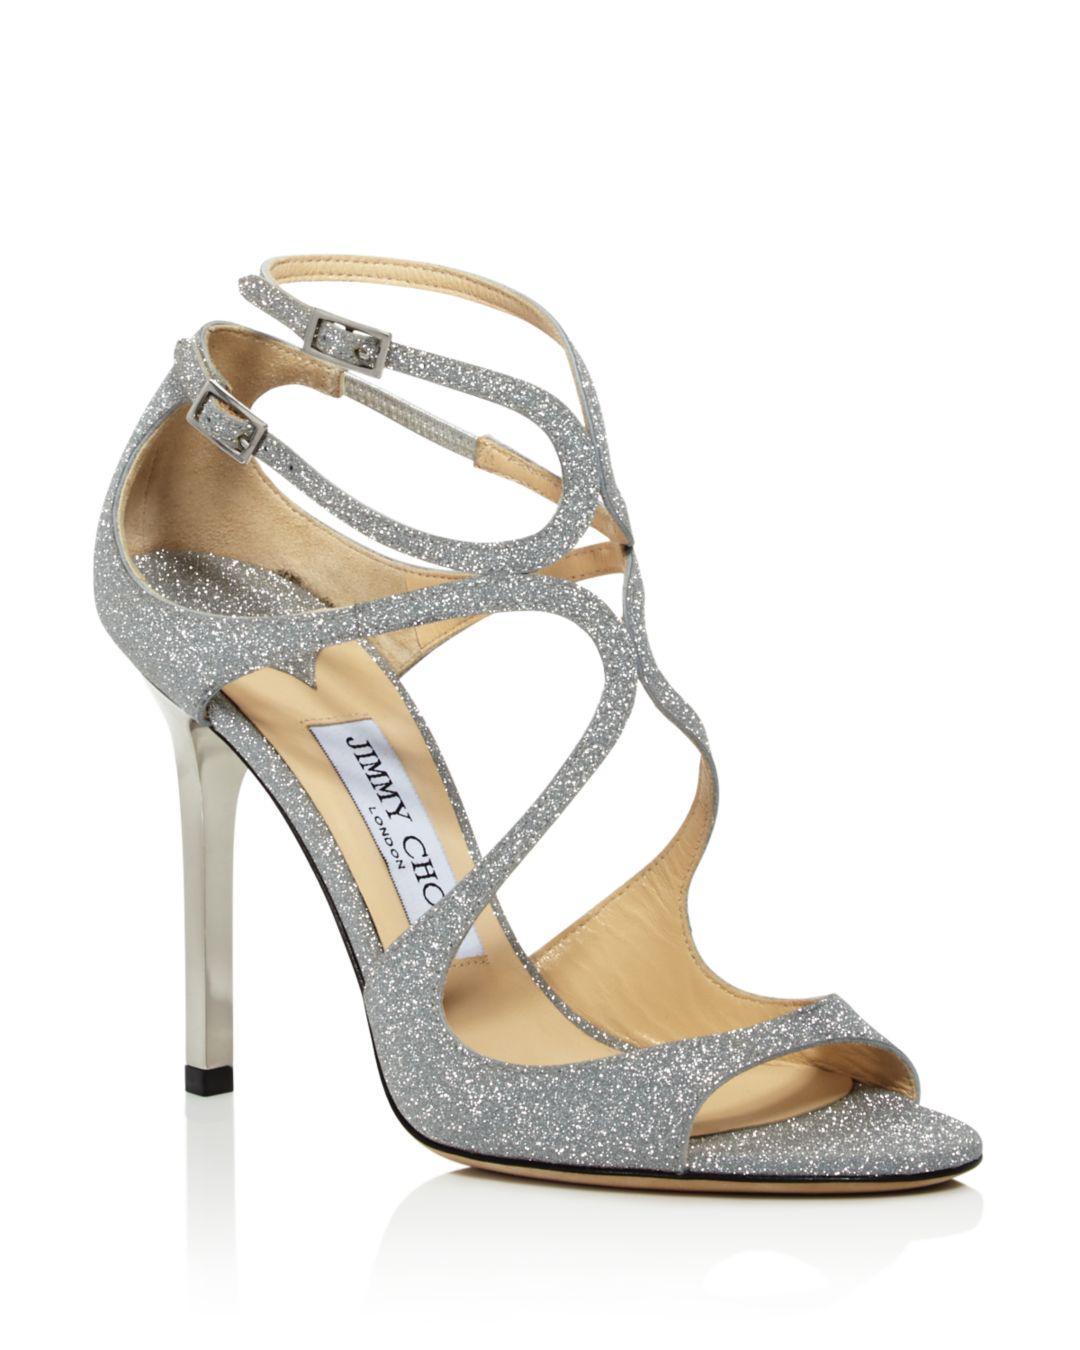 96db7a09dd7 Lyst - Jimmy Choo Women s Lang 100 High-heel Sandals in Metallic